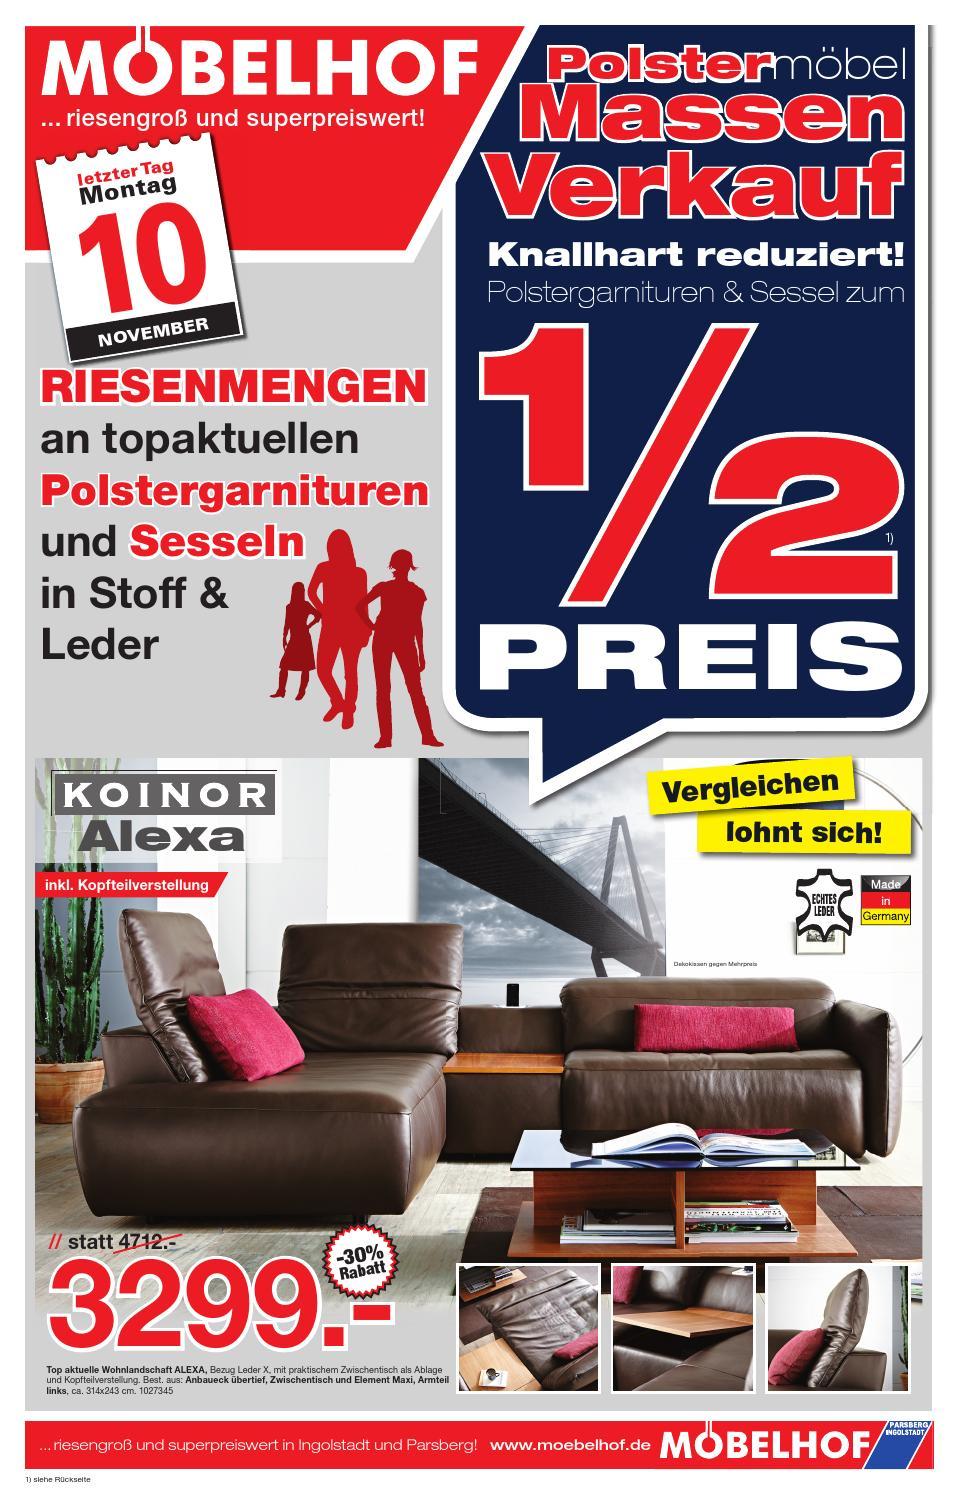 prospekt moebelhof f r den 05 bis by perspektive werbeagentur issuu. Black Bedroom Furniture Sets. Home Design Ideas